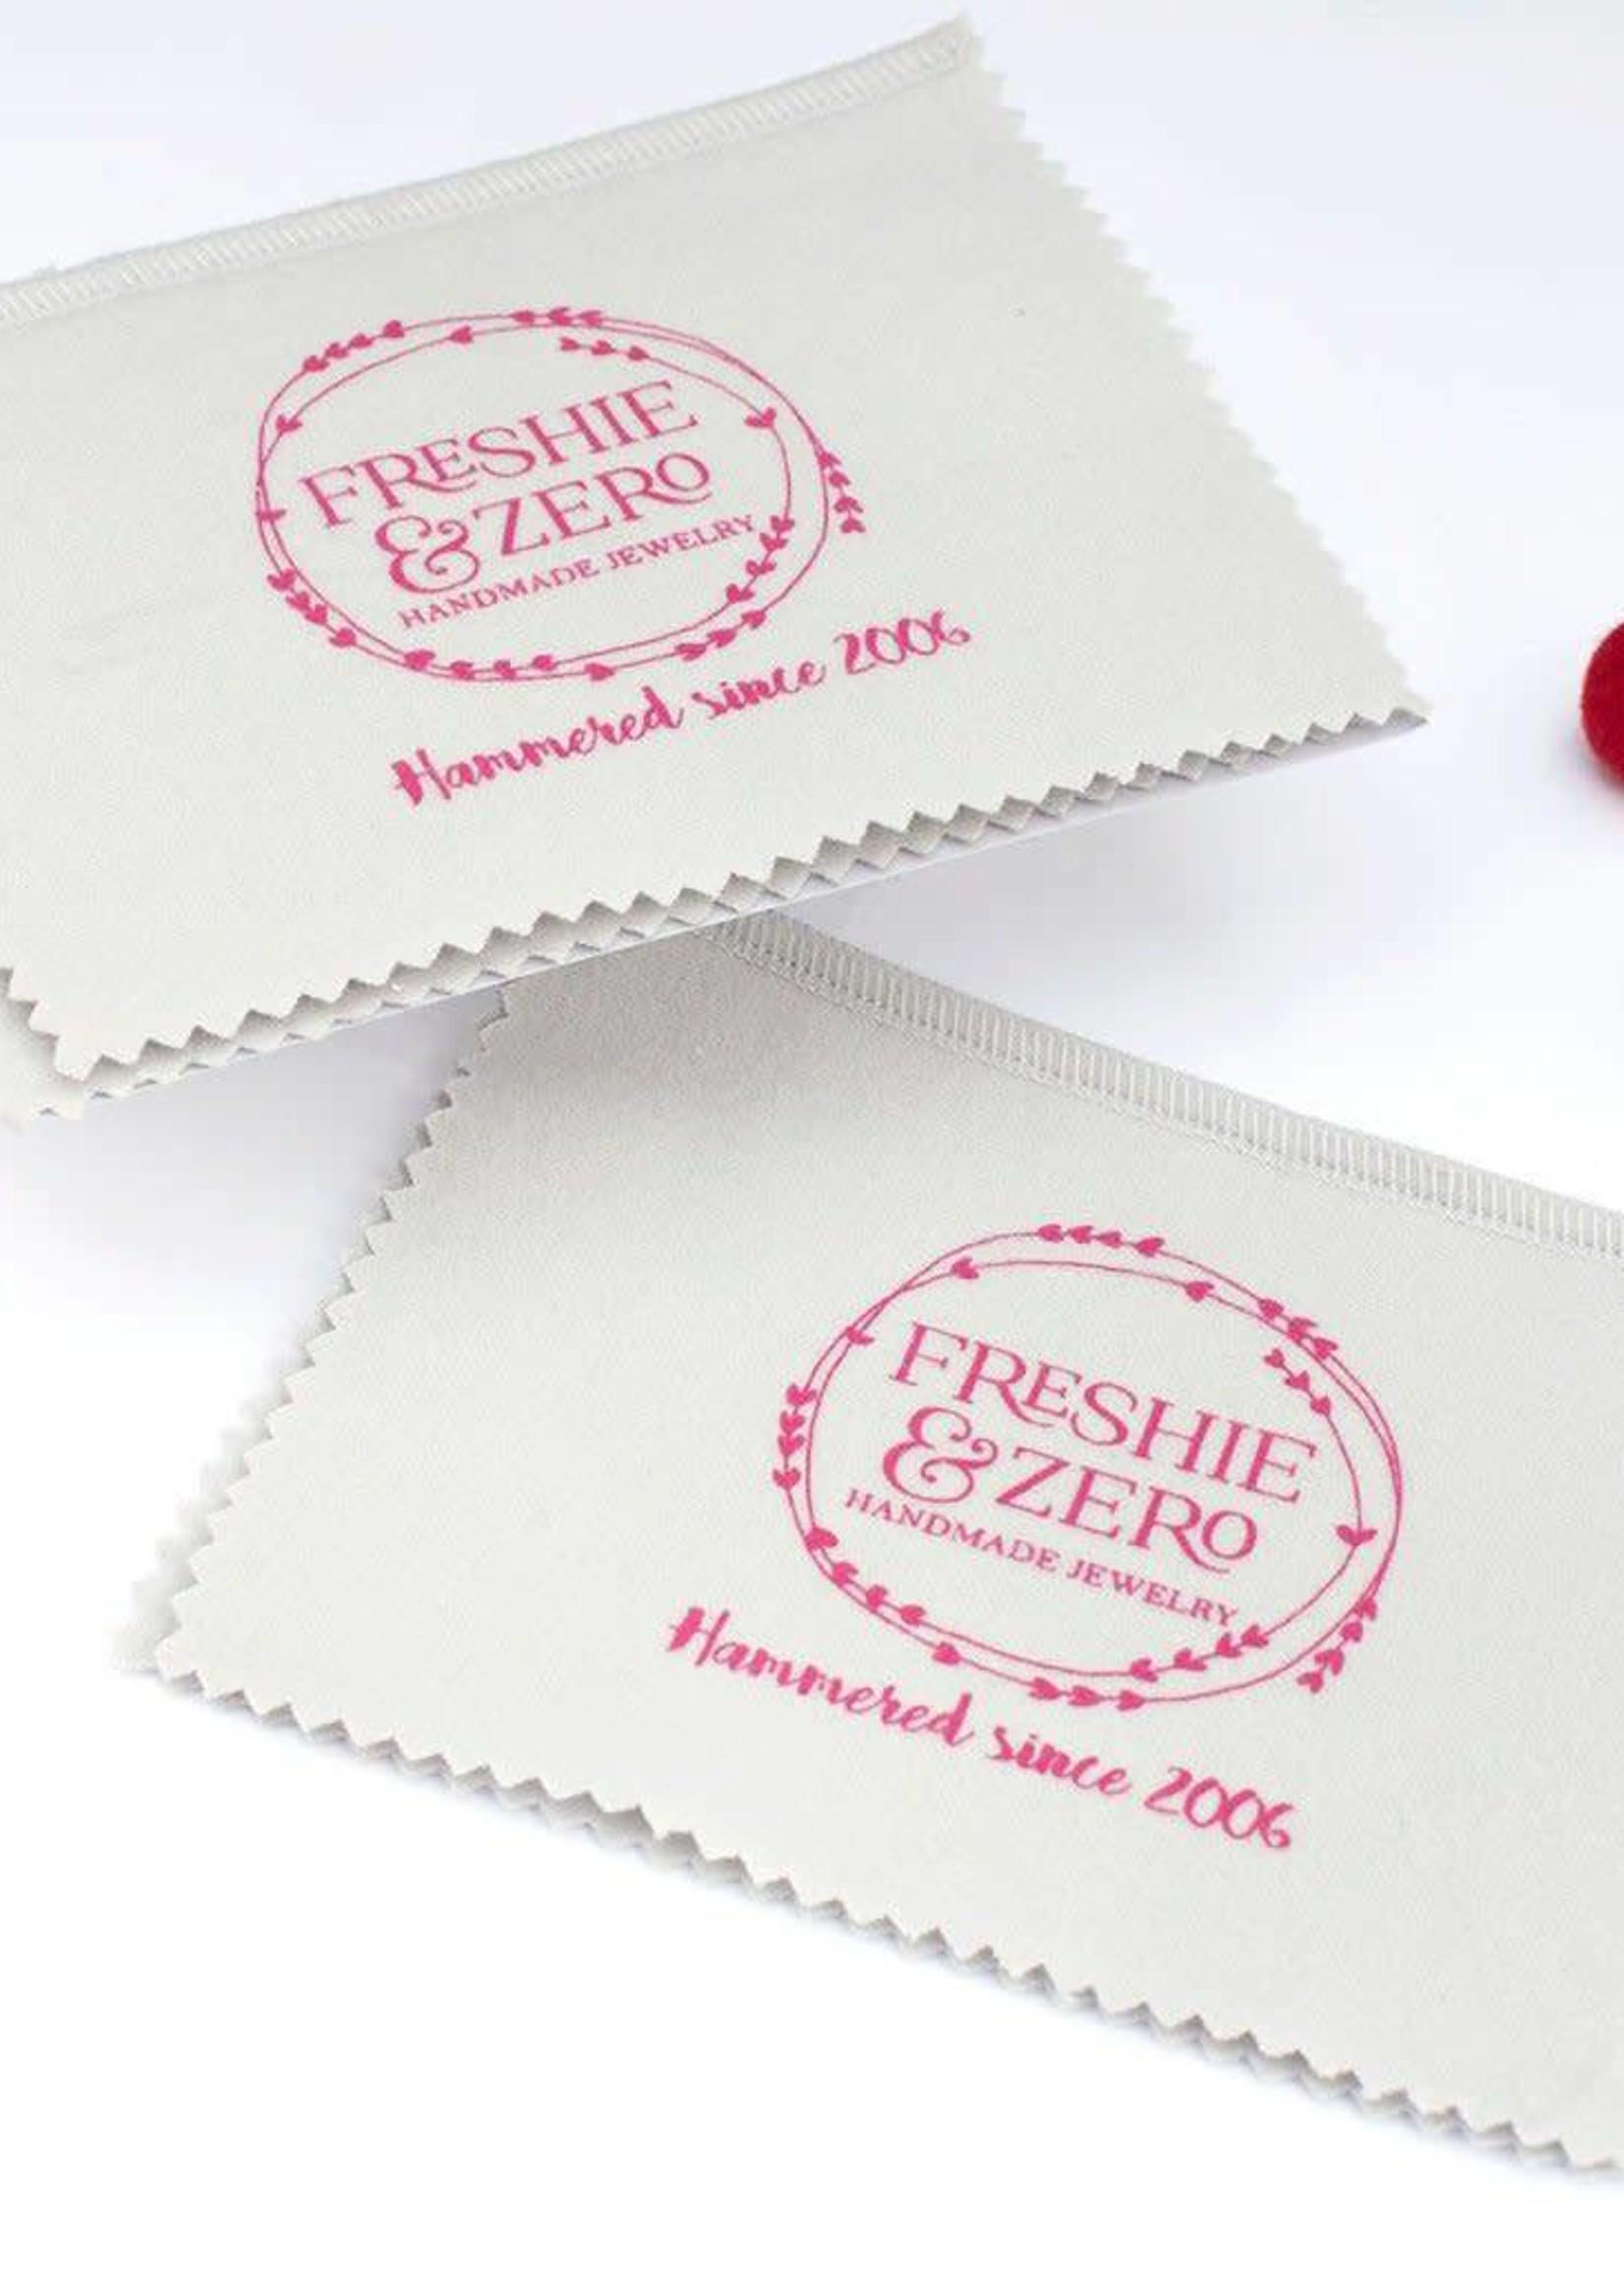 Freshie & Zero Jewelry Polishing Cloth